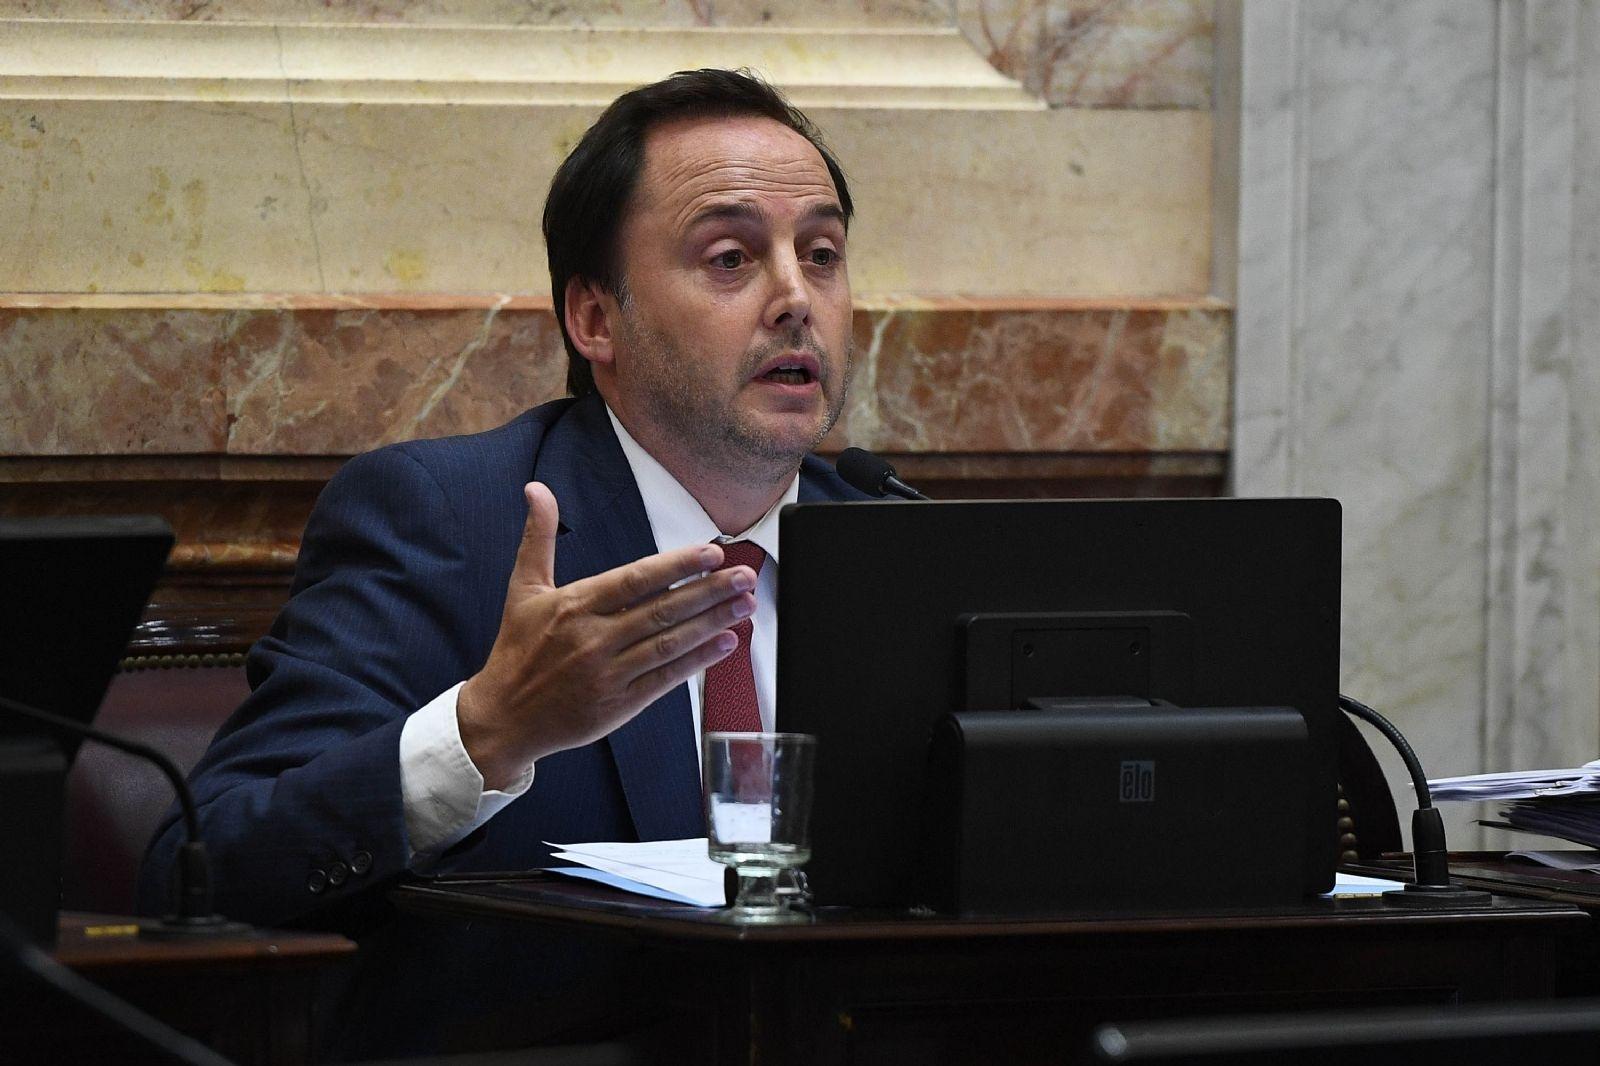 El senador Mera dijo que  es un castigo a los más vulnerables no mantener el reintegro del IVA